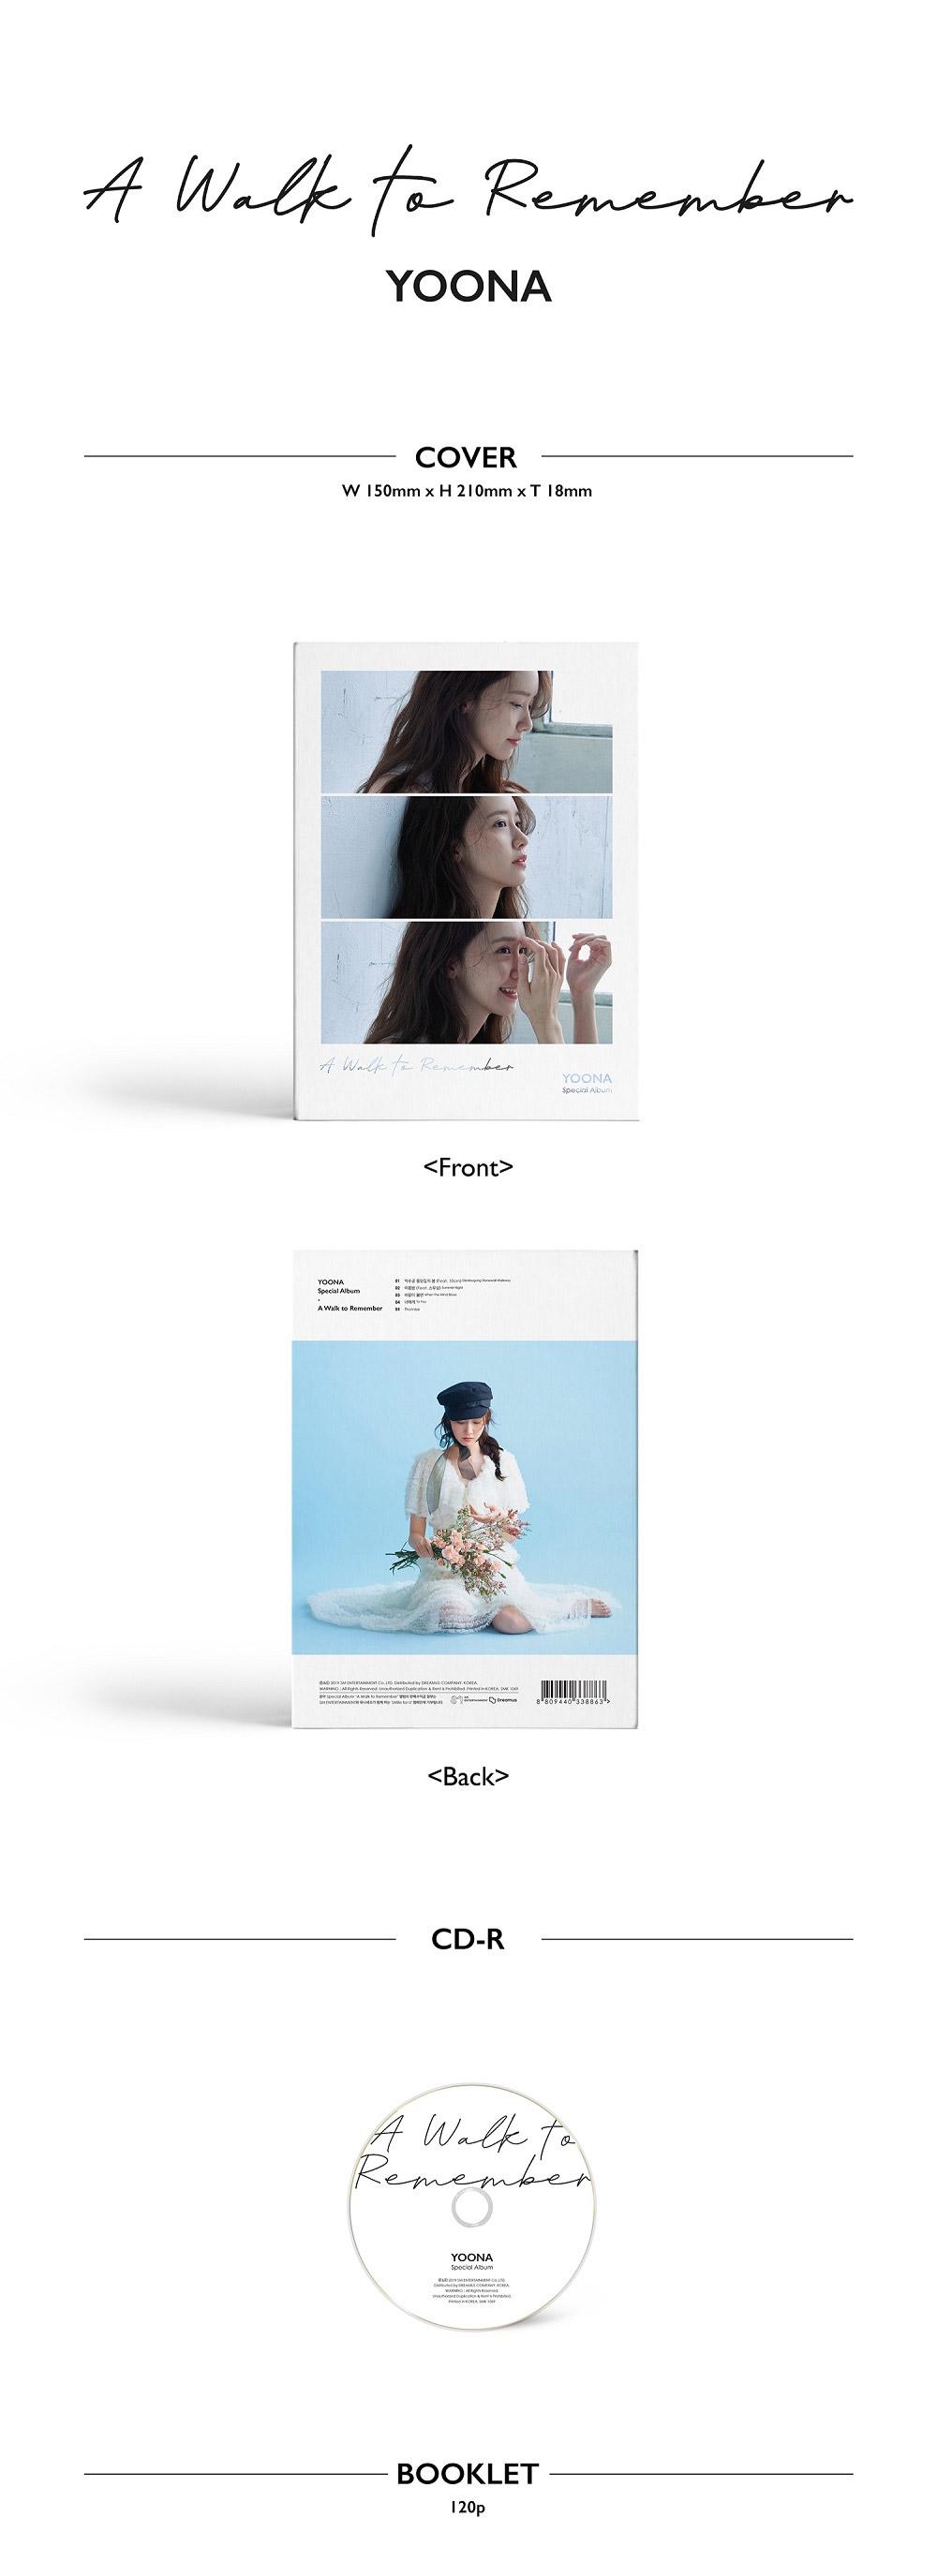 yoona_sp_01.jpg